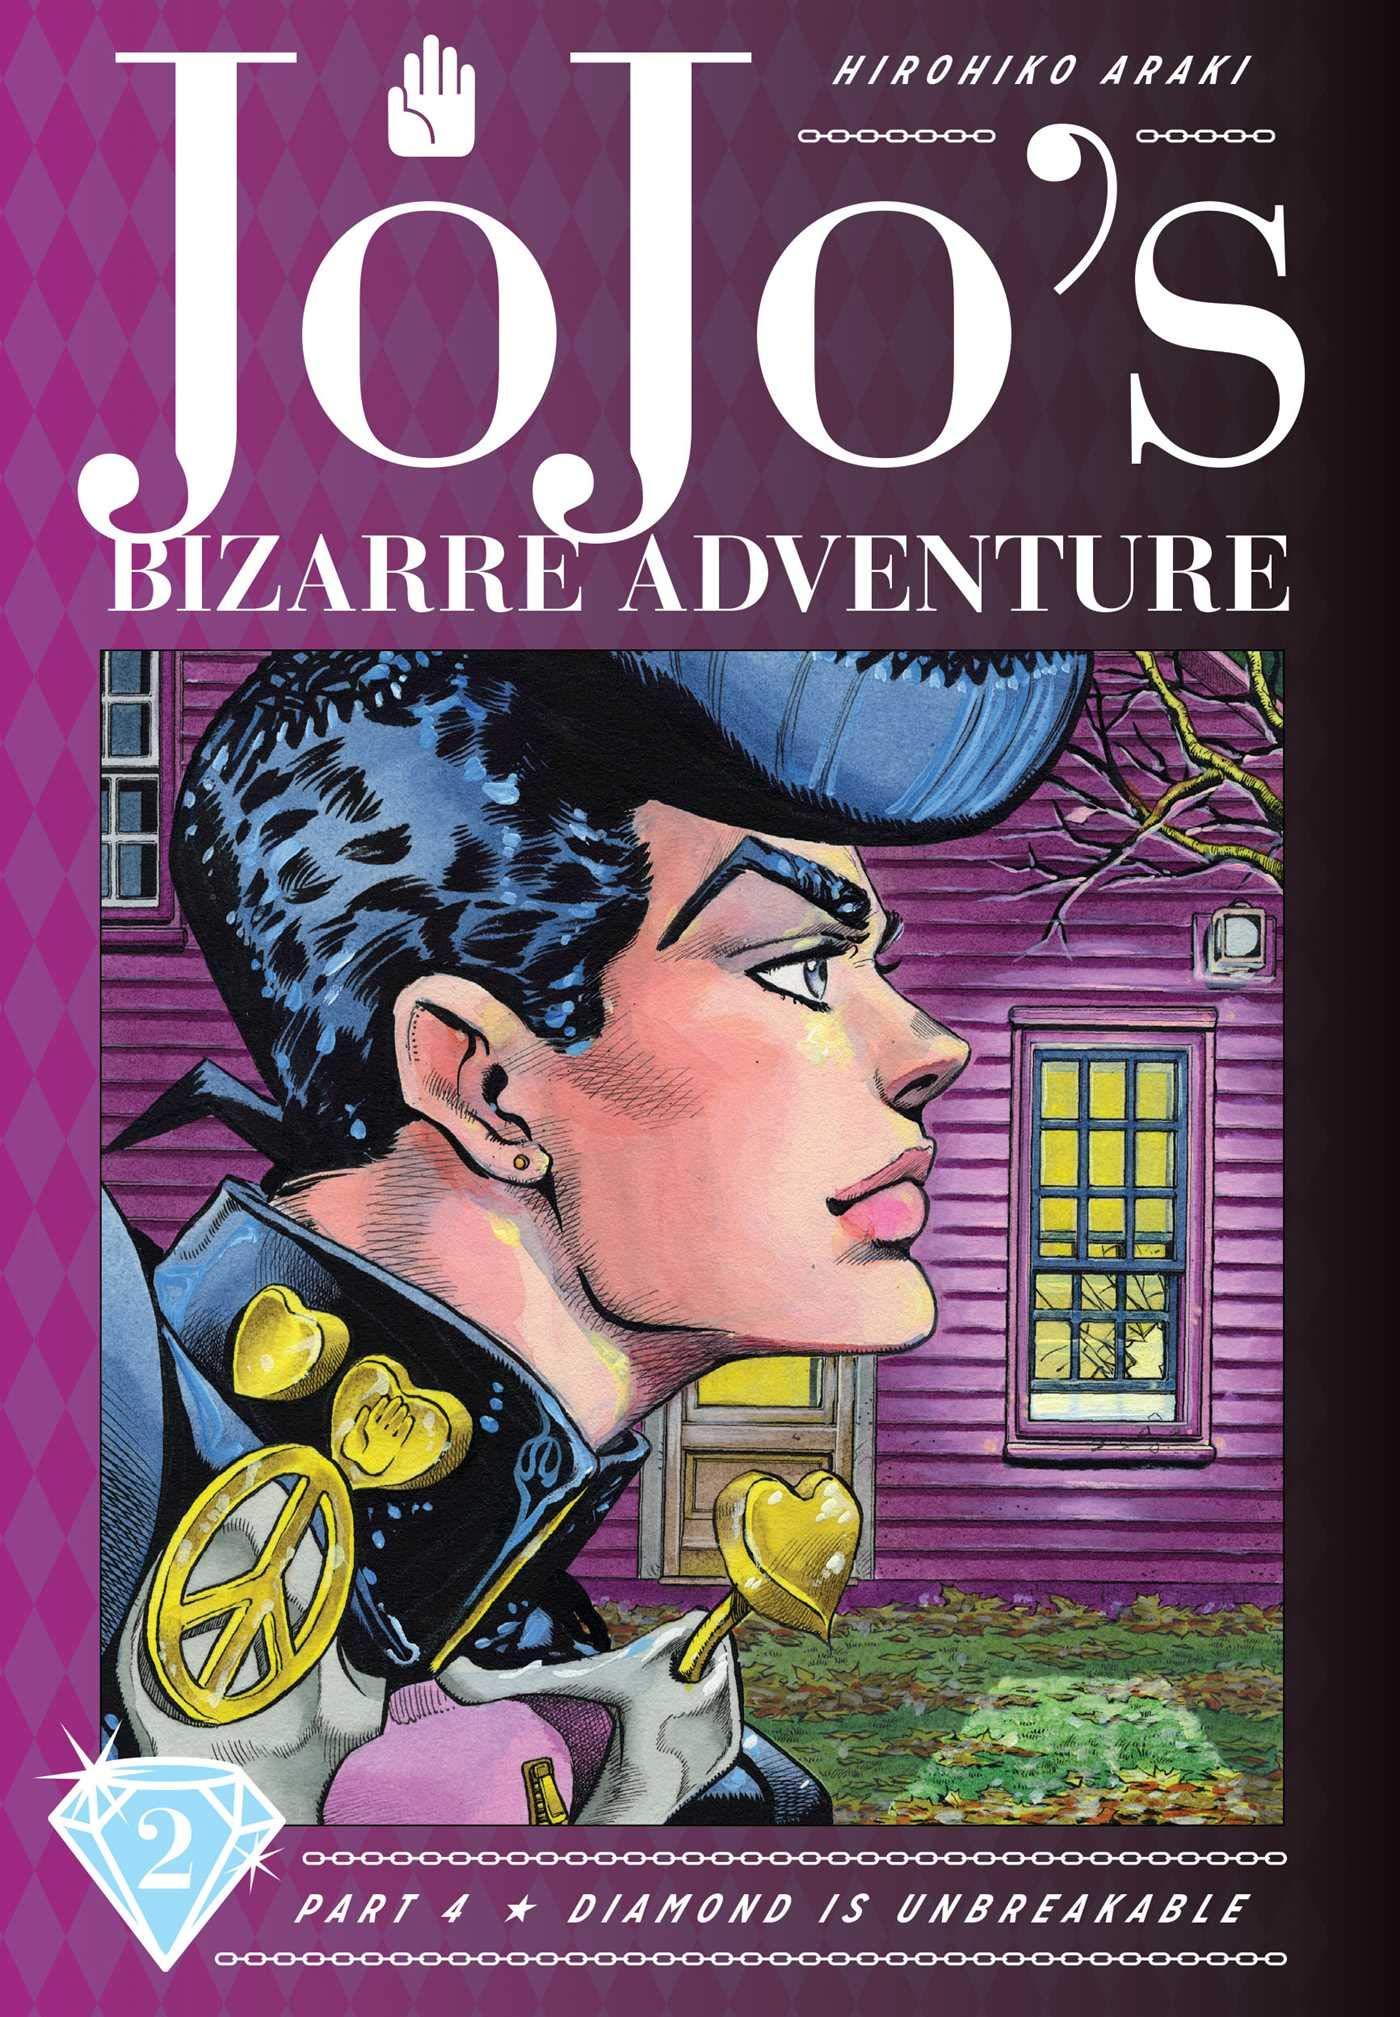 JoJo's Bizarre Adventure: Part 4--Diamond Is Unbreakable, Vol. 2 thumbnail